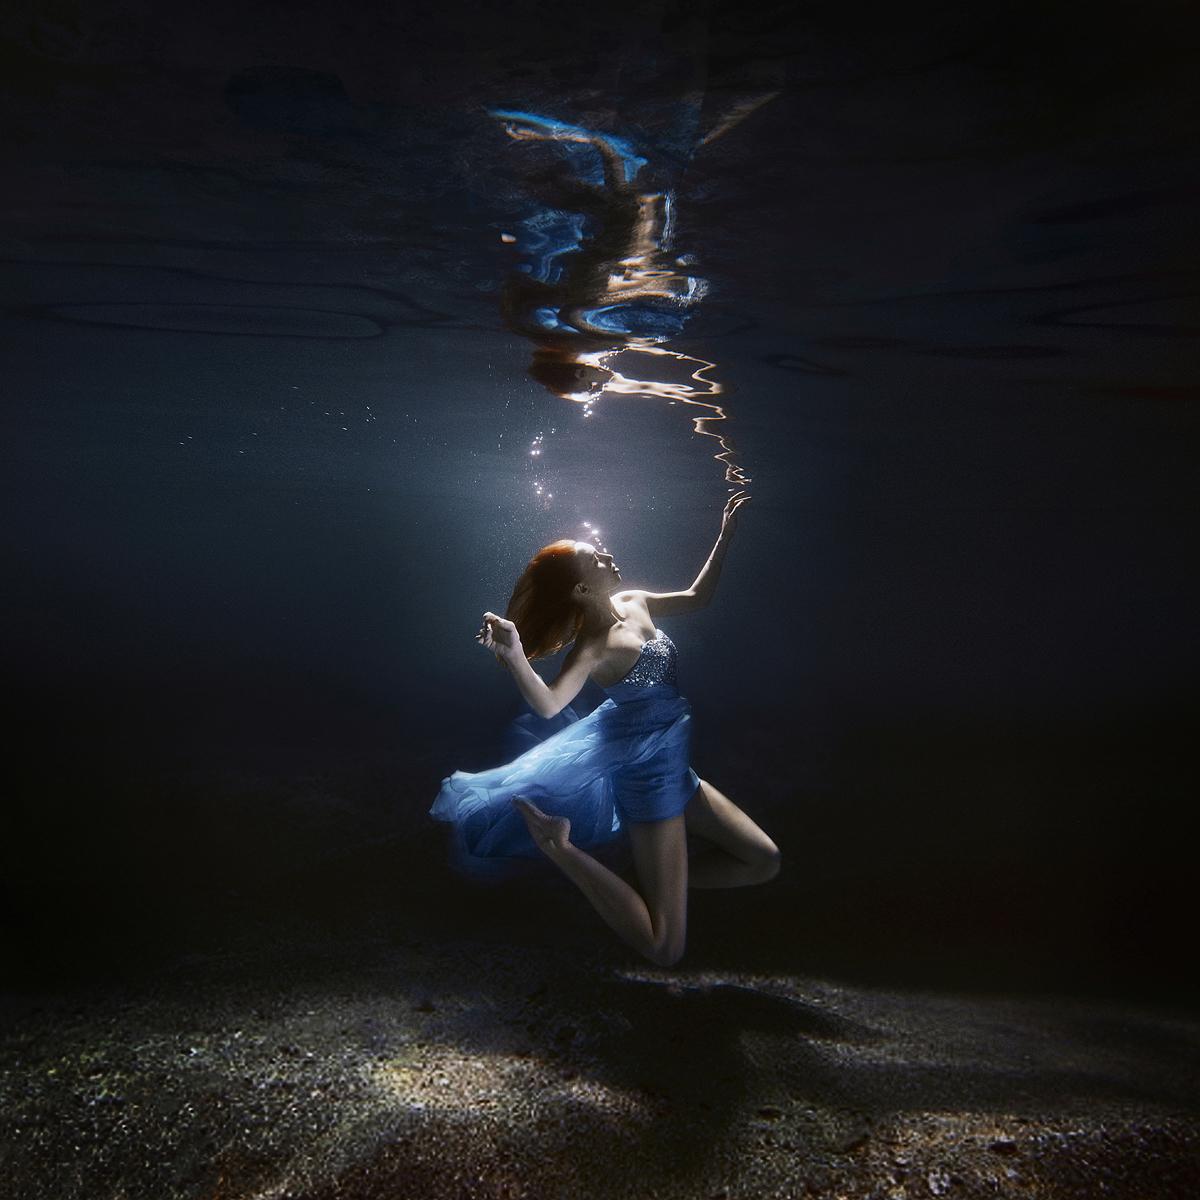 stylish-and-romantic-underwater-photography-by-glory-grebenkin-11